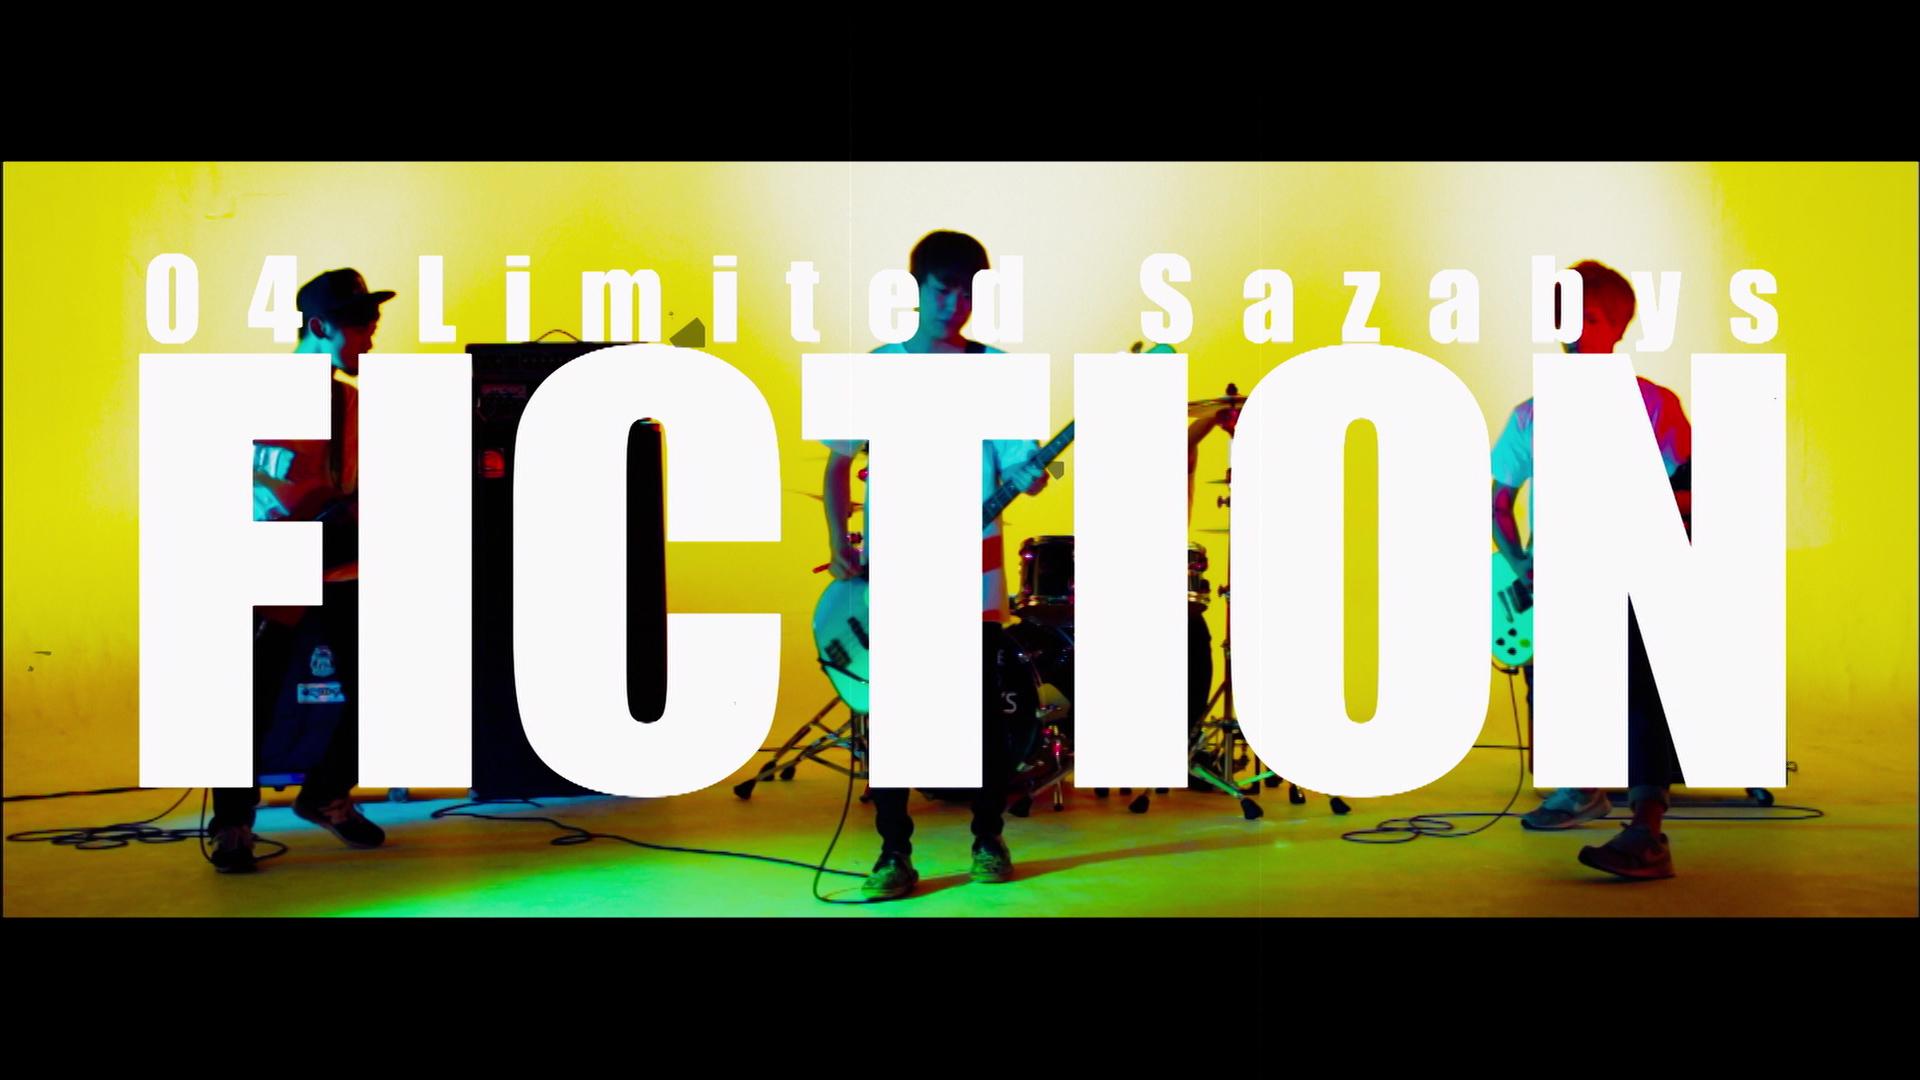 04 Limited Sazabys Cavu から Fiction Mv公開 15 06 24 邦楽ニュース 音楽情報サイトrockinon Com ロッキング オン ドットコム